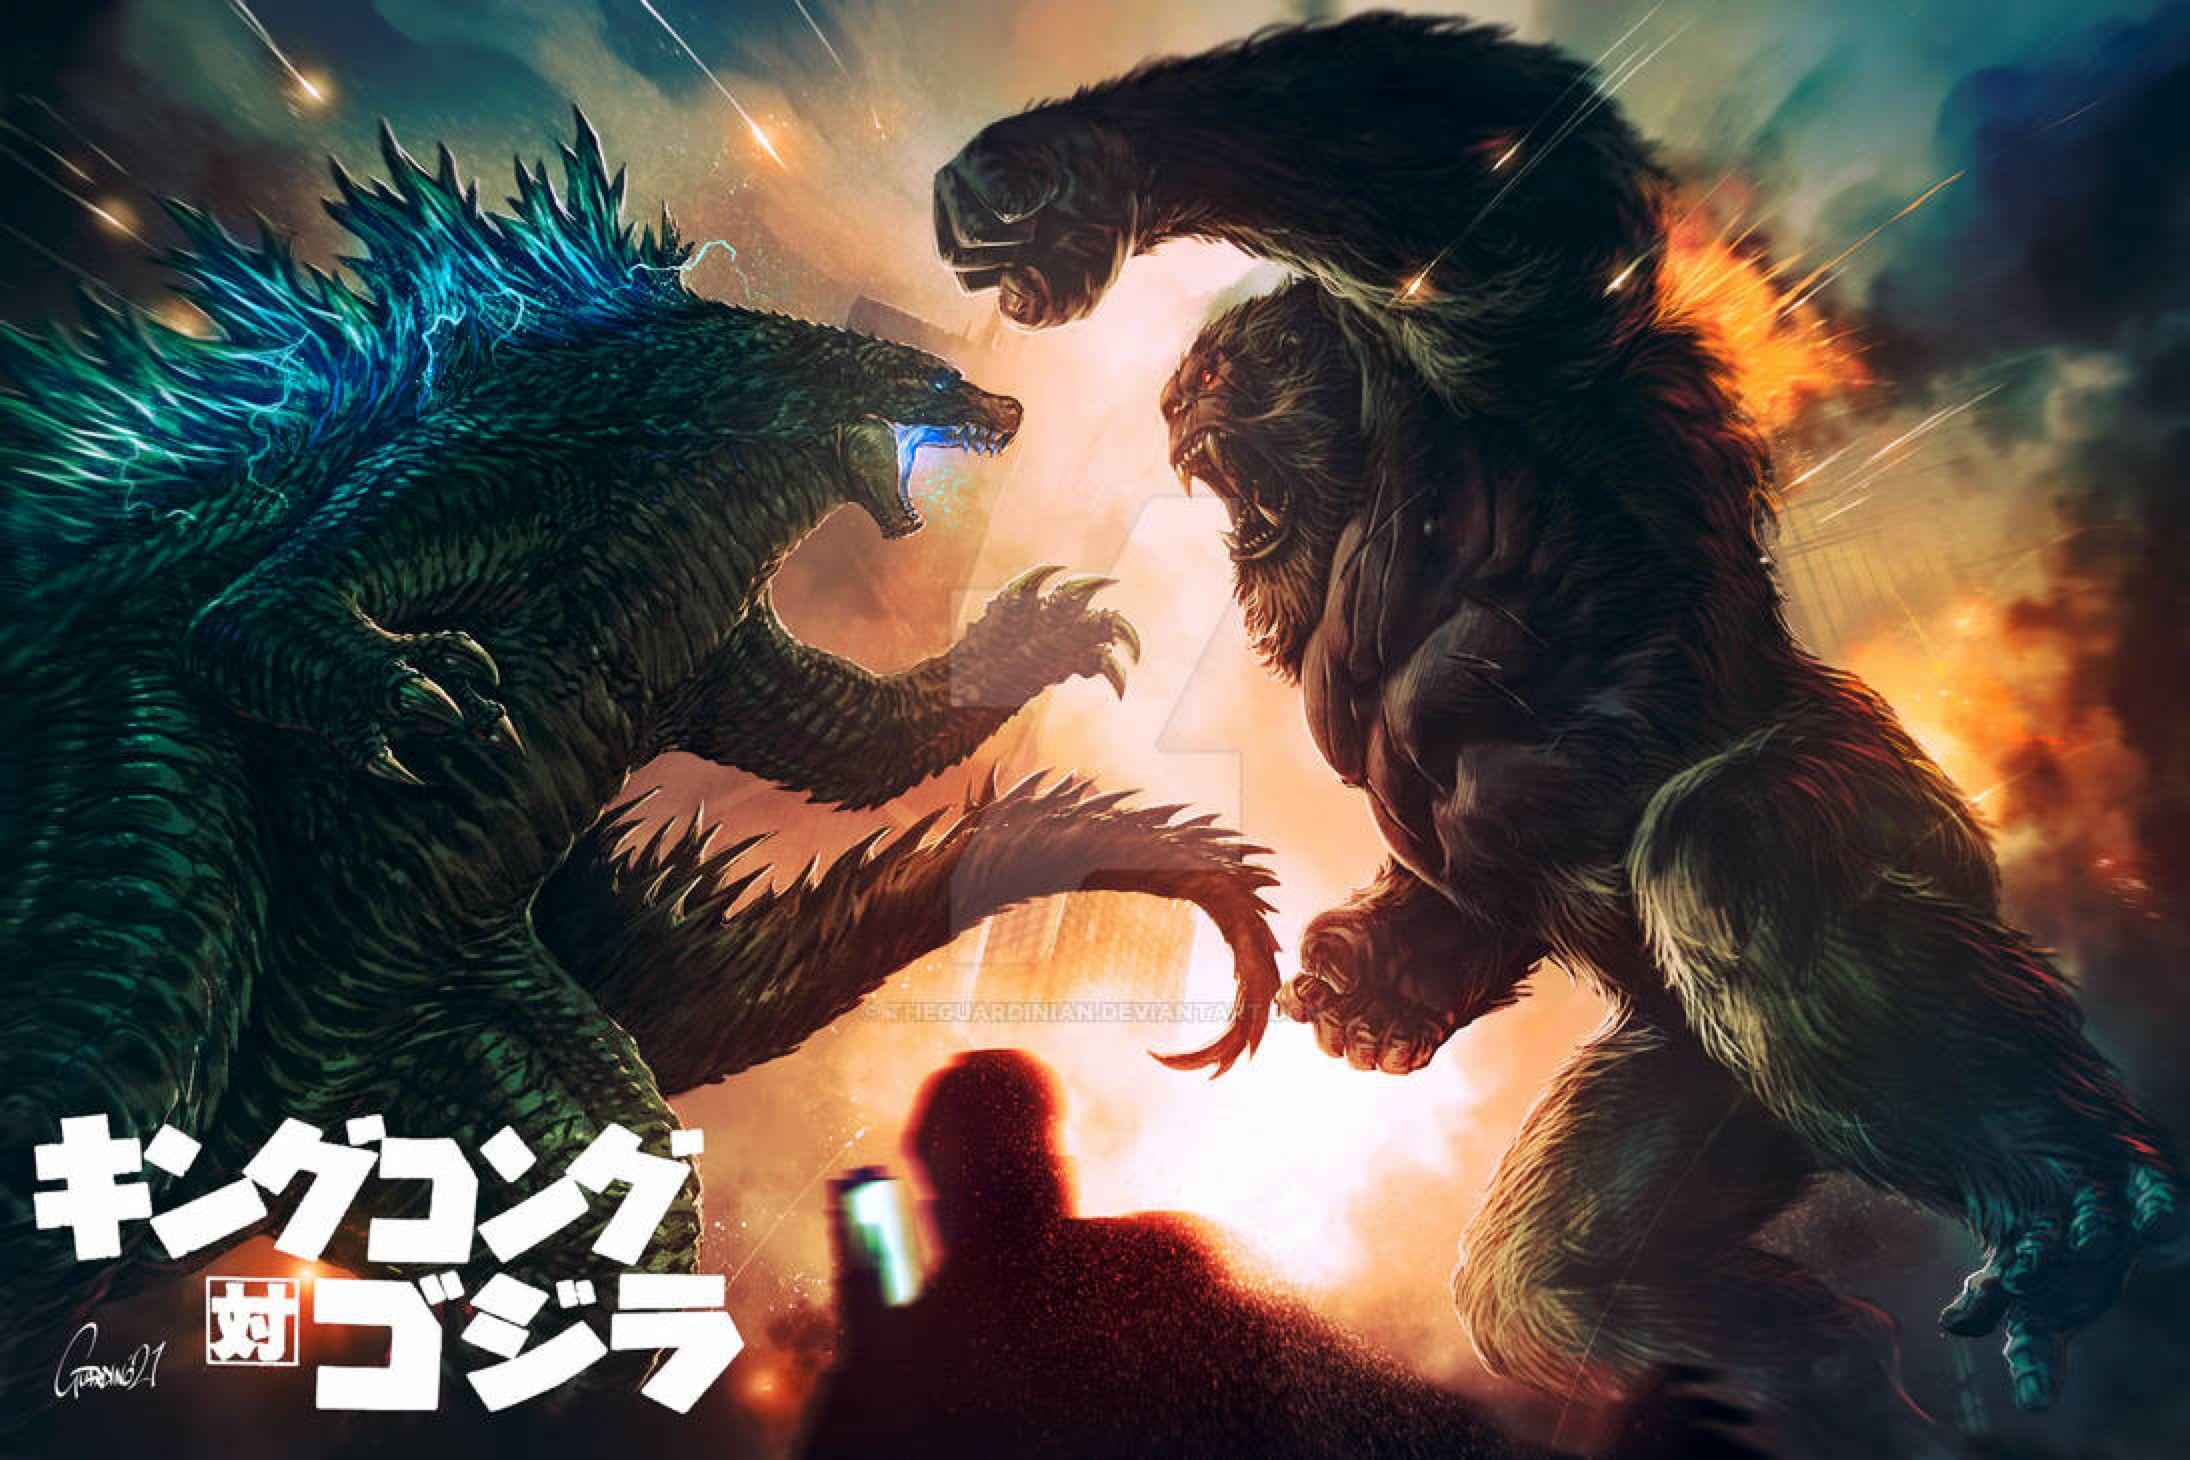 Godzilla vs kong by theguardinian on deviantart in 2021